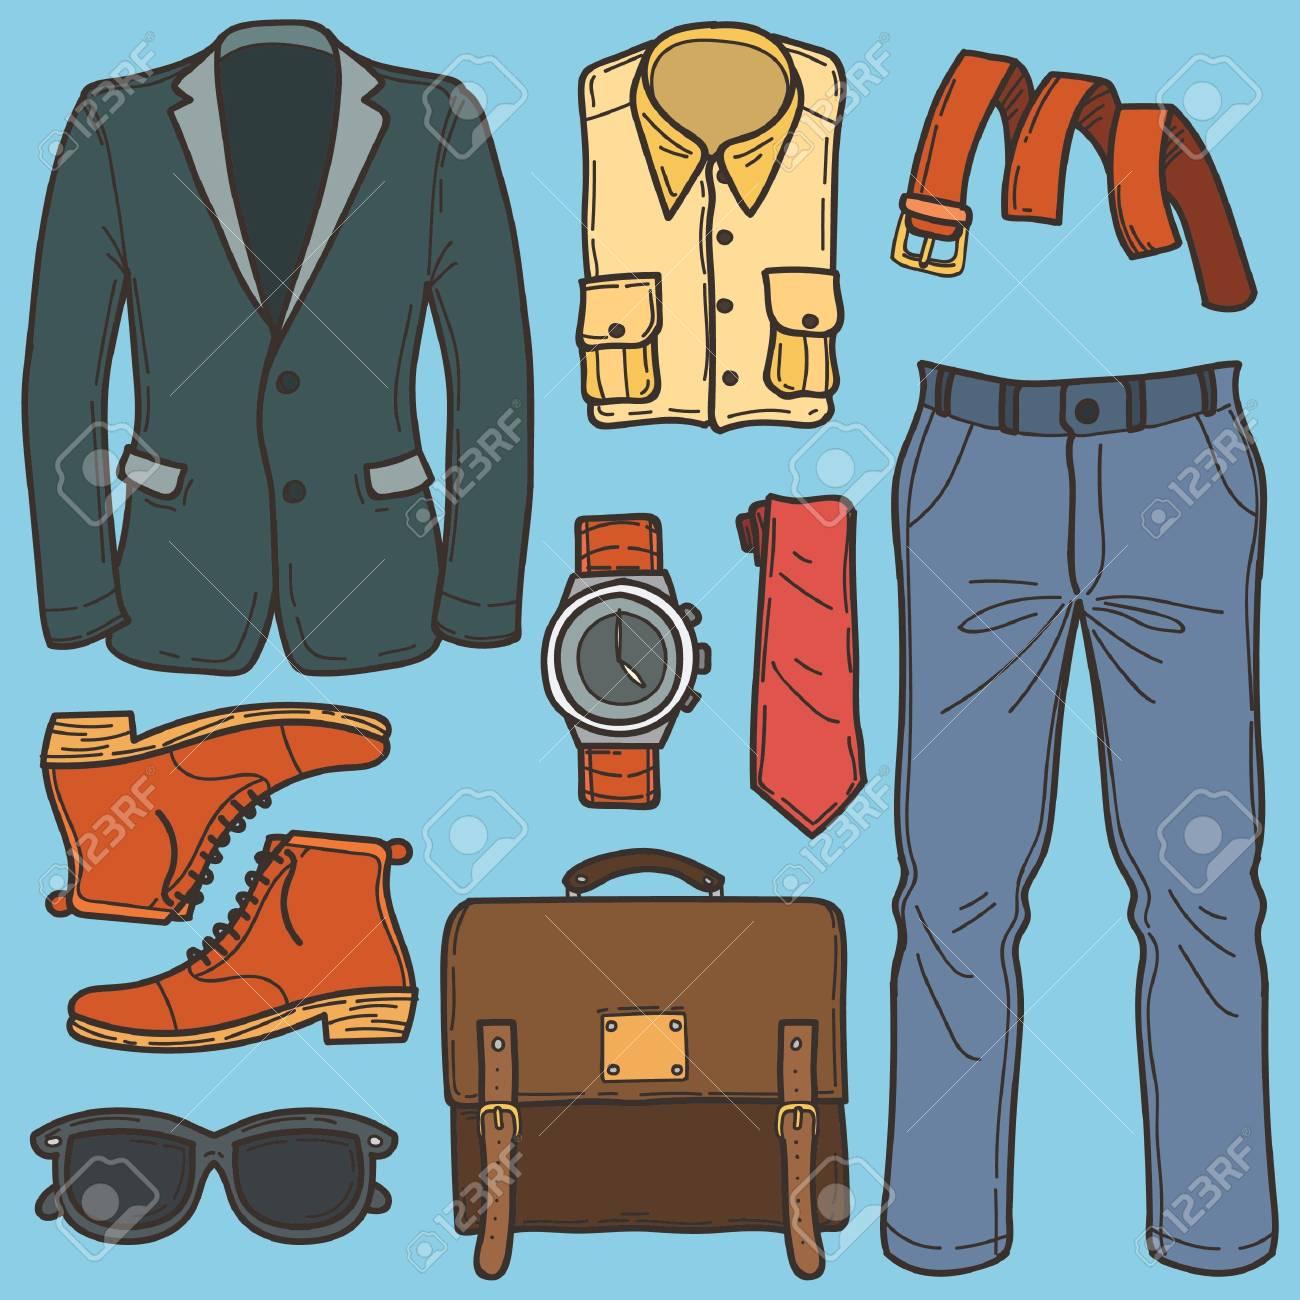 2debfa22be2 men fashion set Stock Vector - 77327418